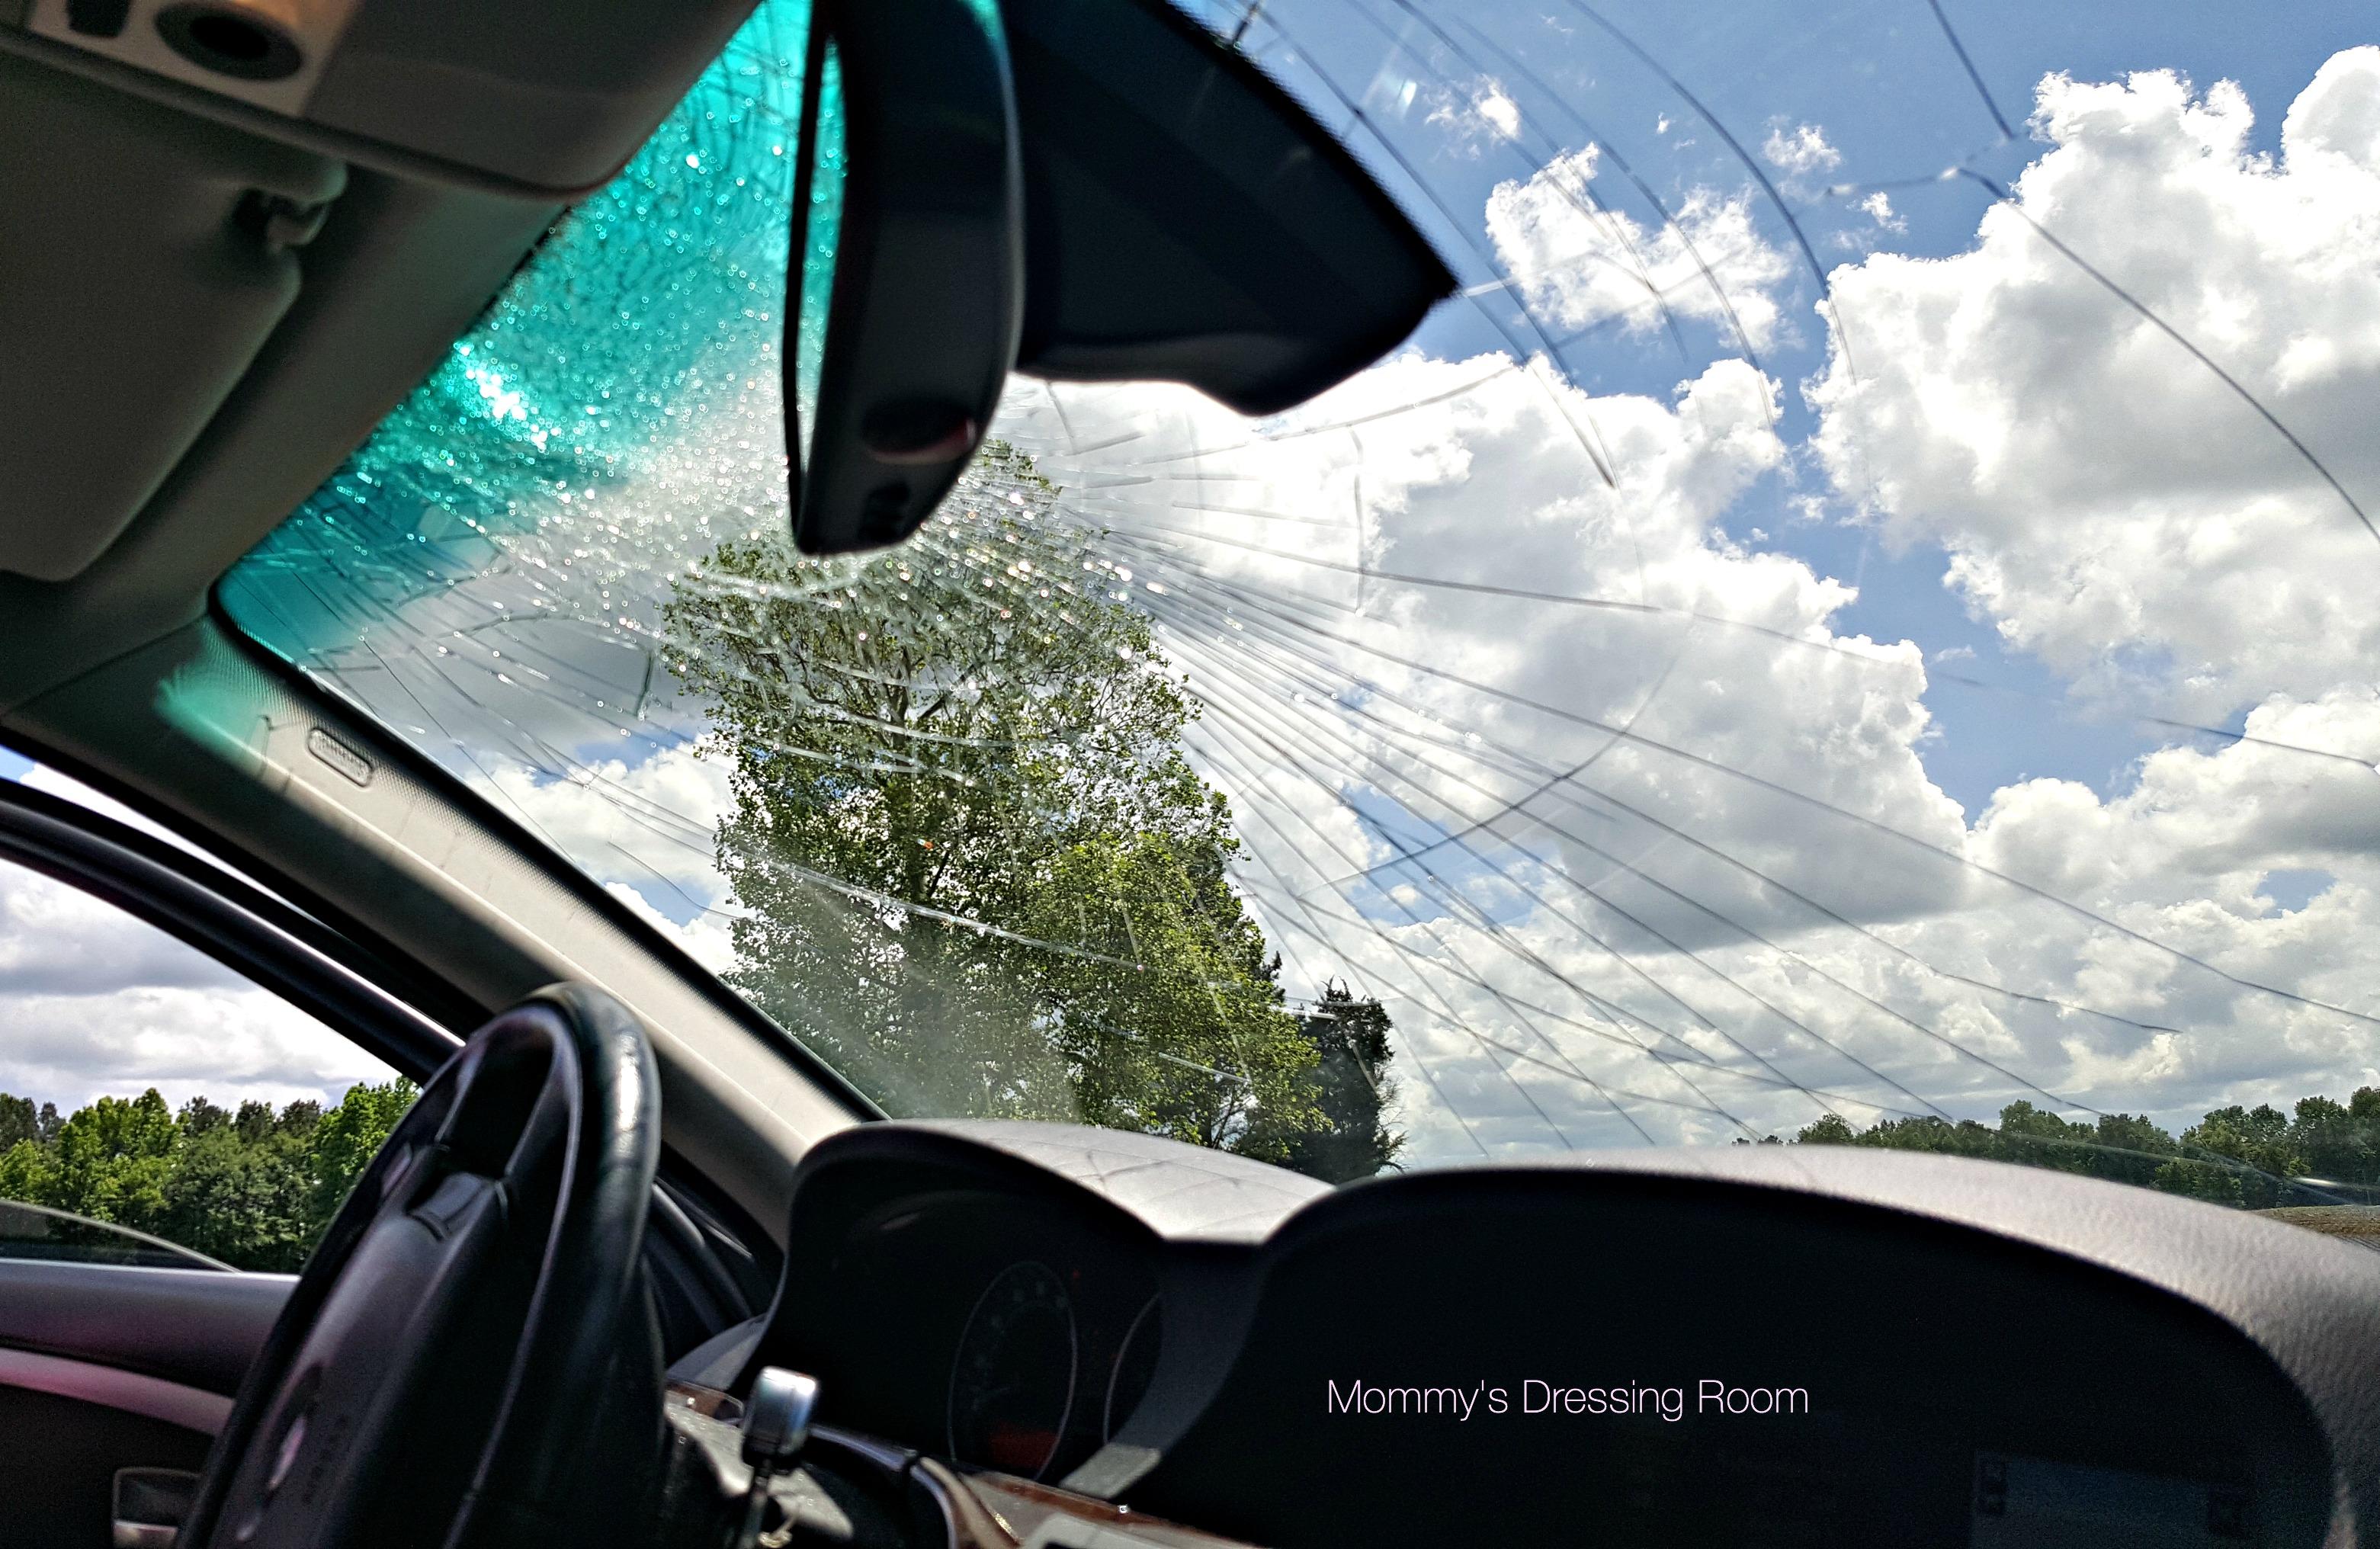 turkey-safelight-country road-bmw-windshield